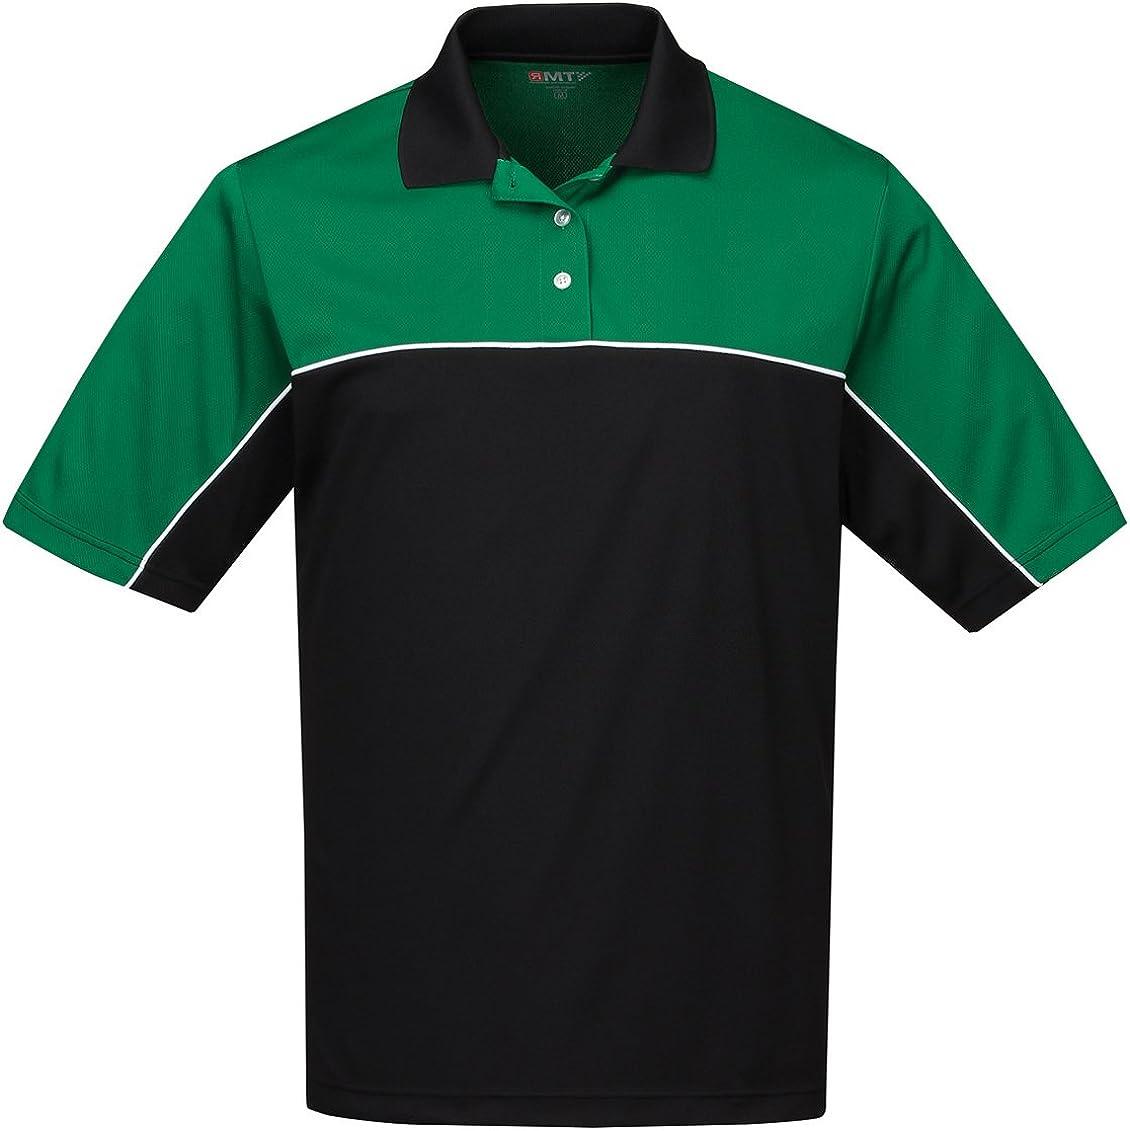 Mens Kelly specialty shop Green Premium Style Seasonal Wrap Introduction Polo Shirt